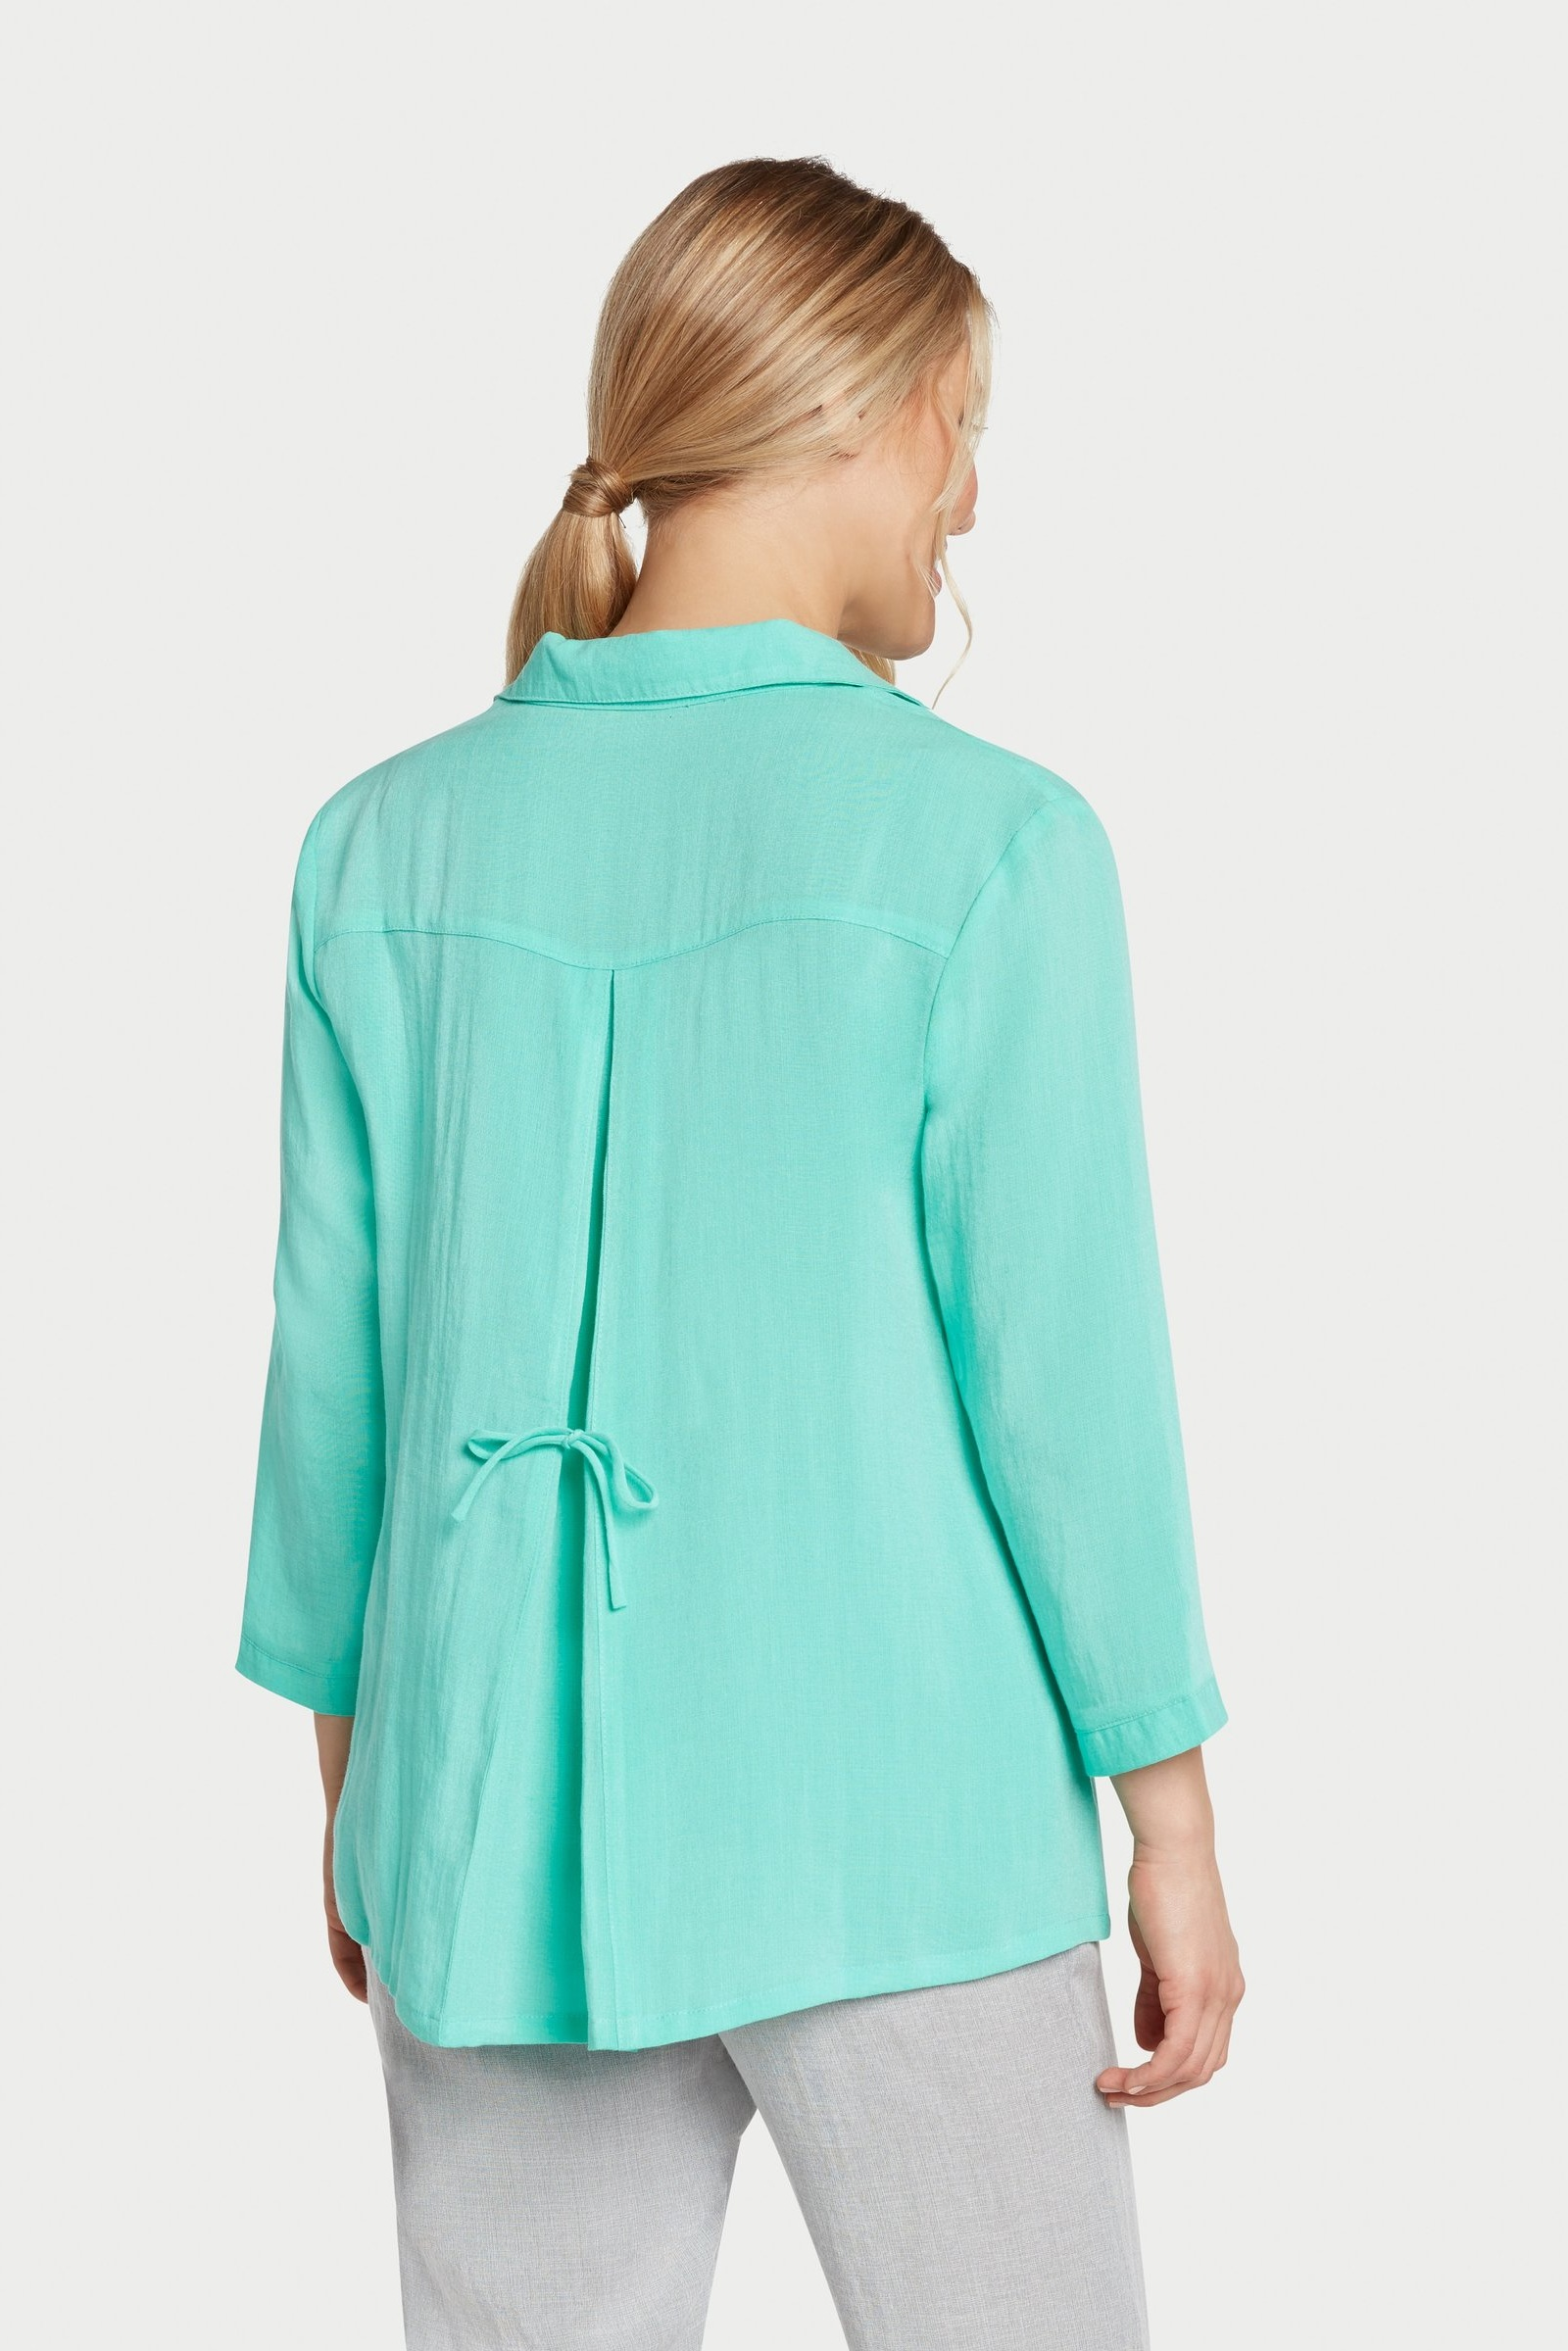 AA248 - Tie-Back Shirt